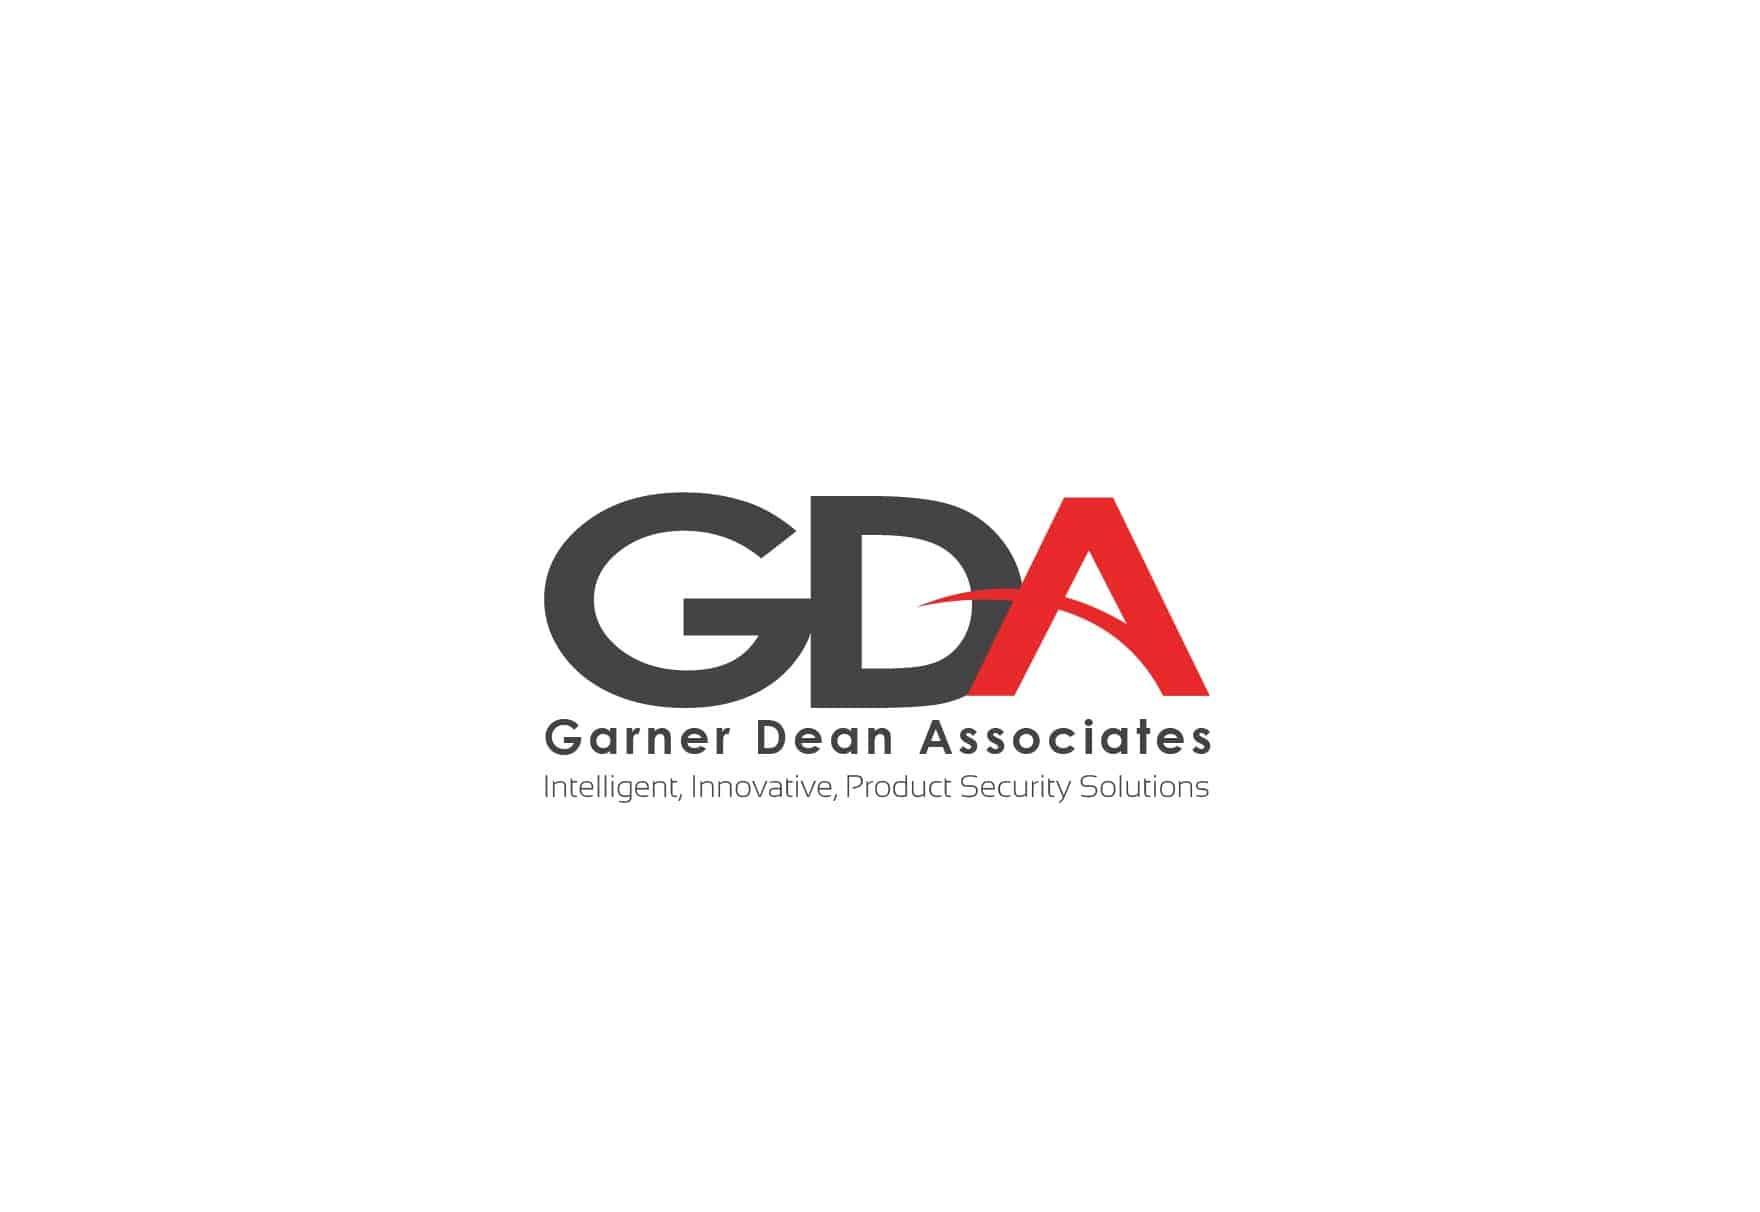 gda-logo-design